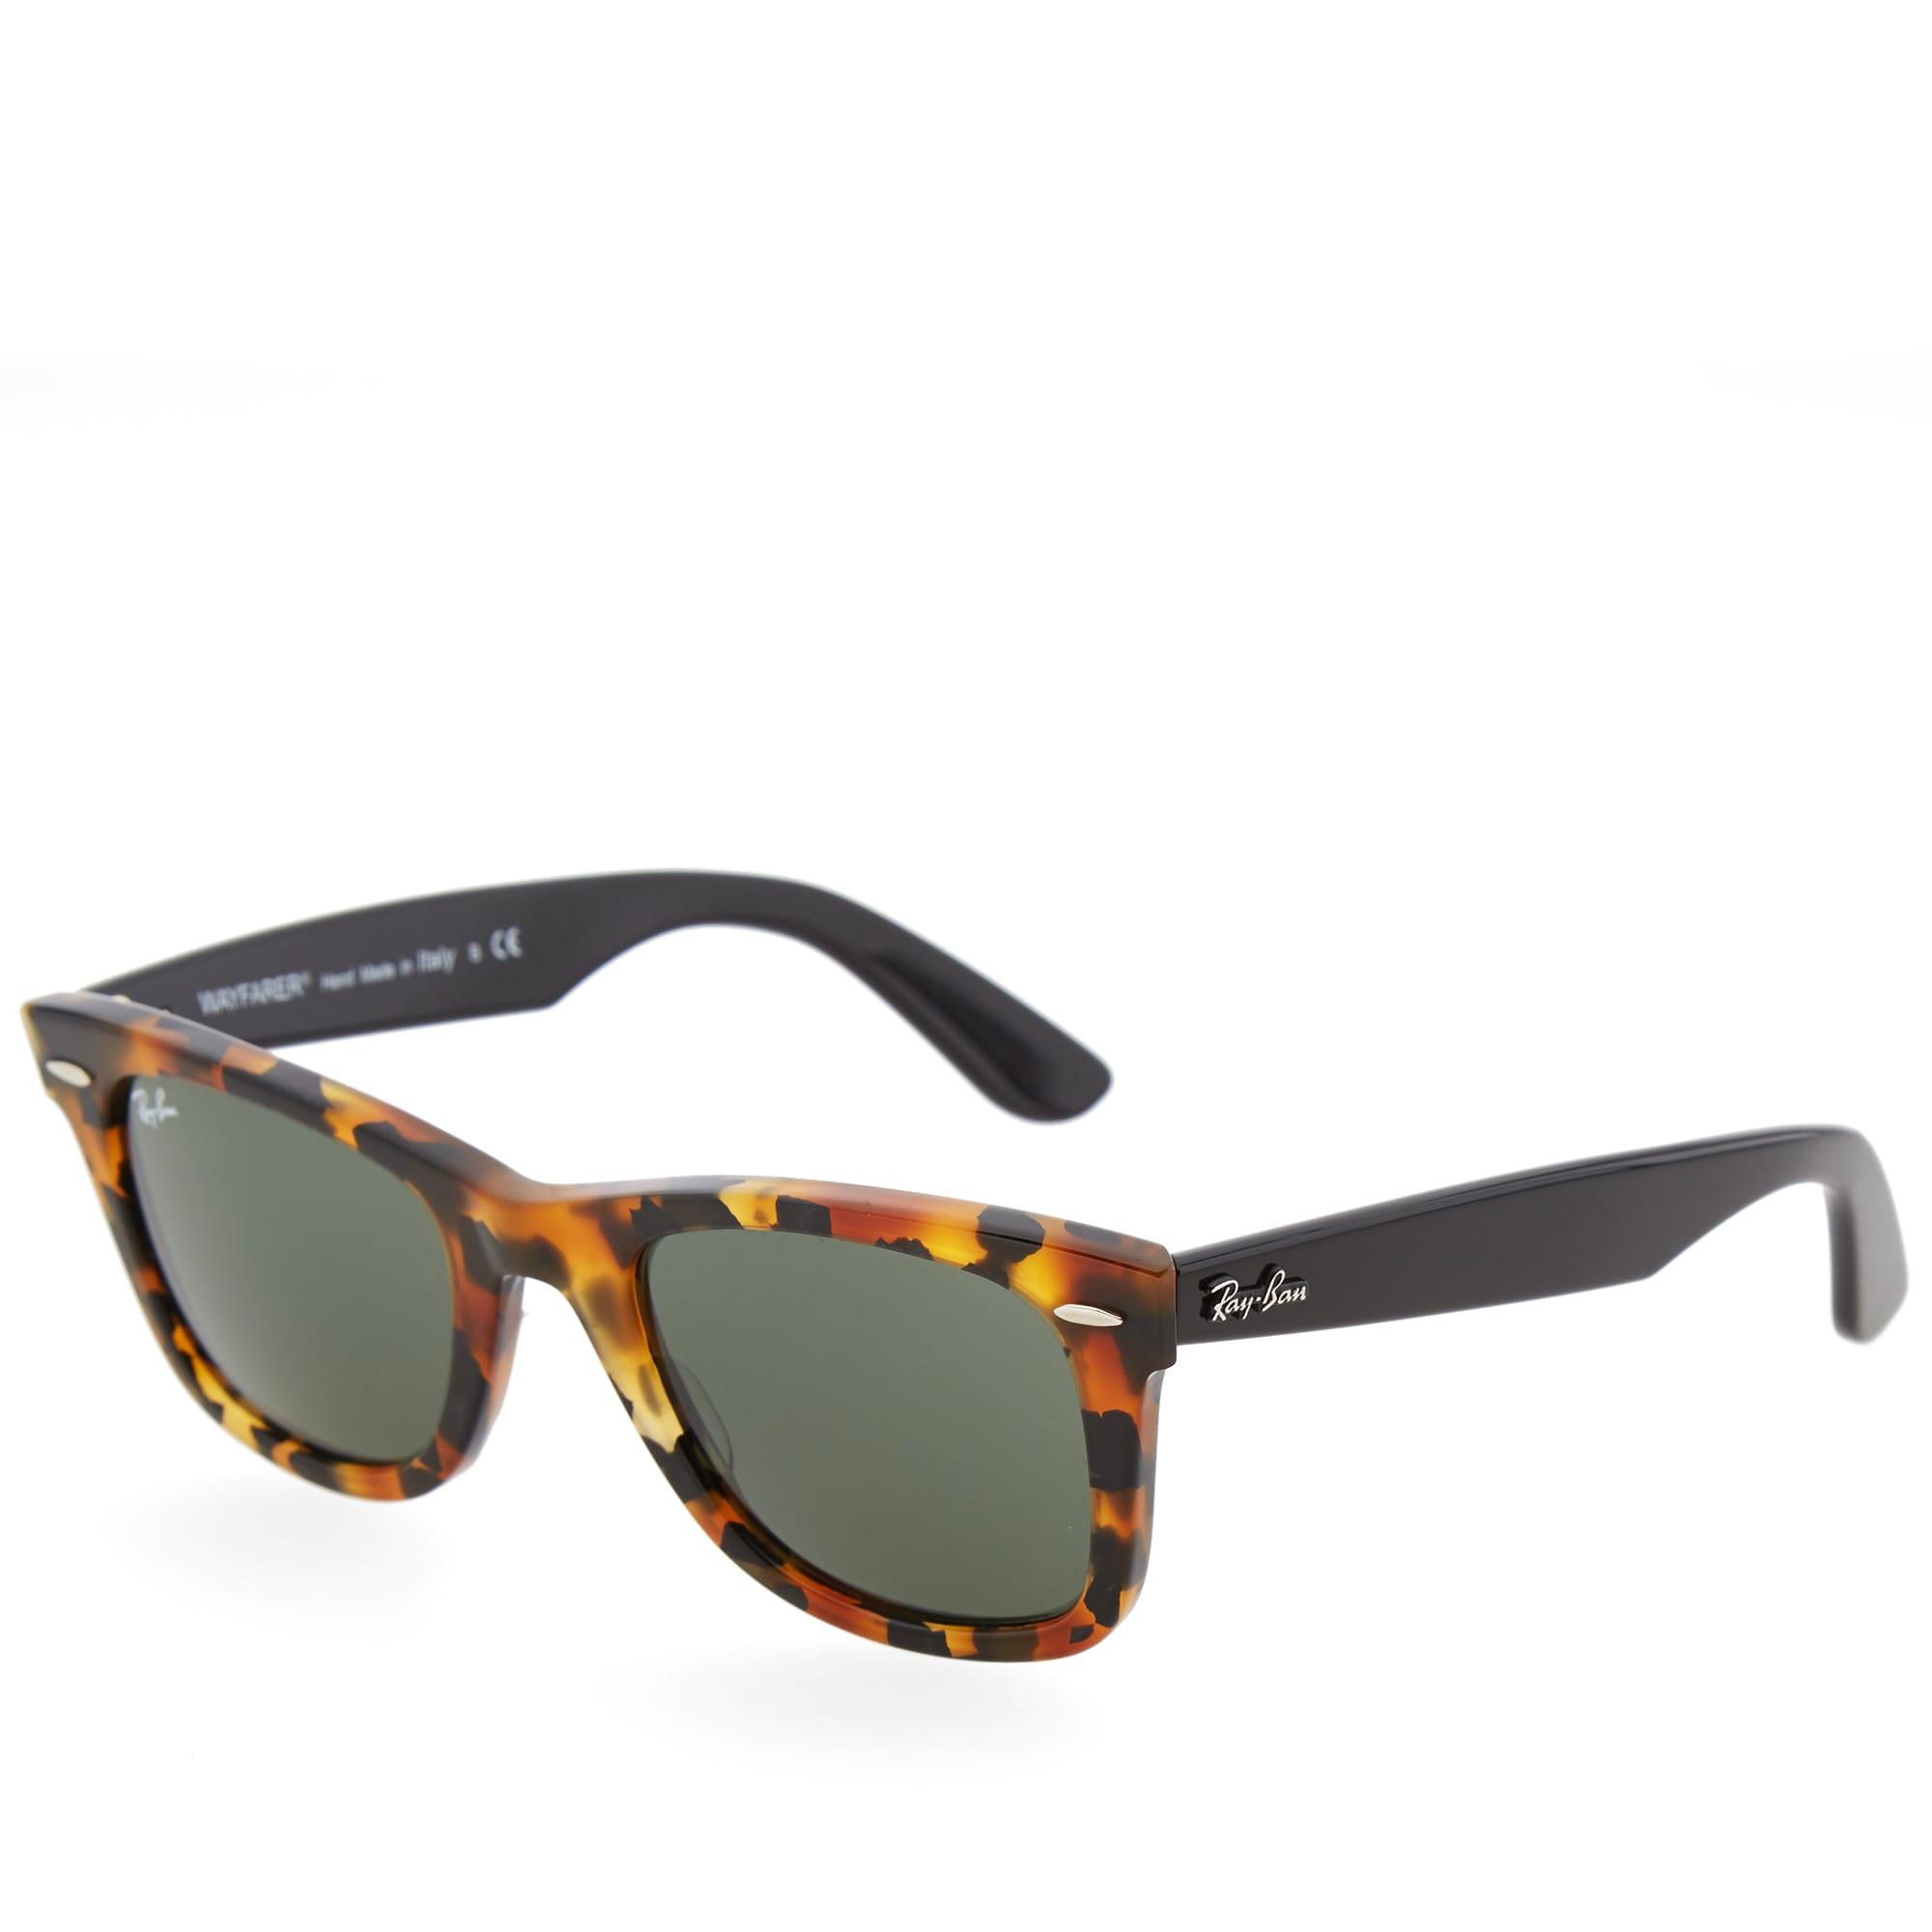 Ray Ban Original Wayfarer Fleck Sunglasses - Spotted Black Havana & Green